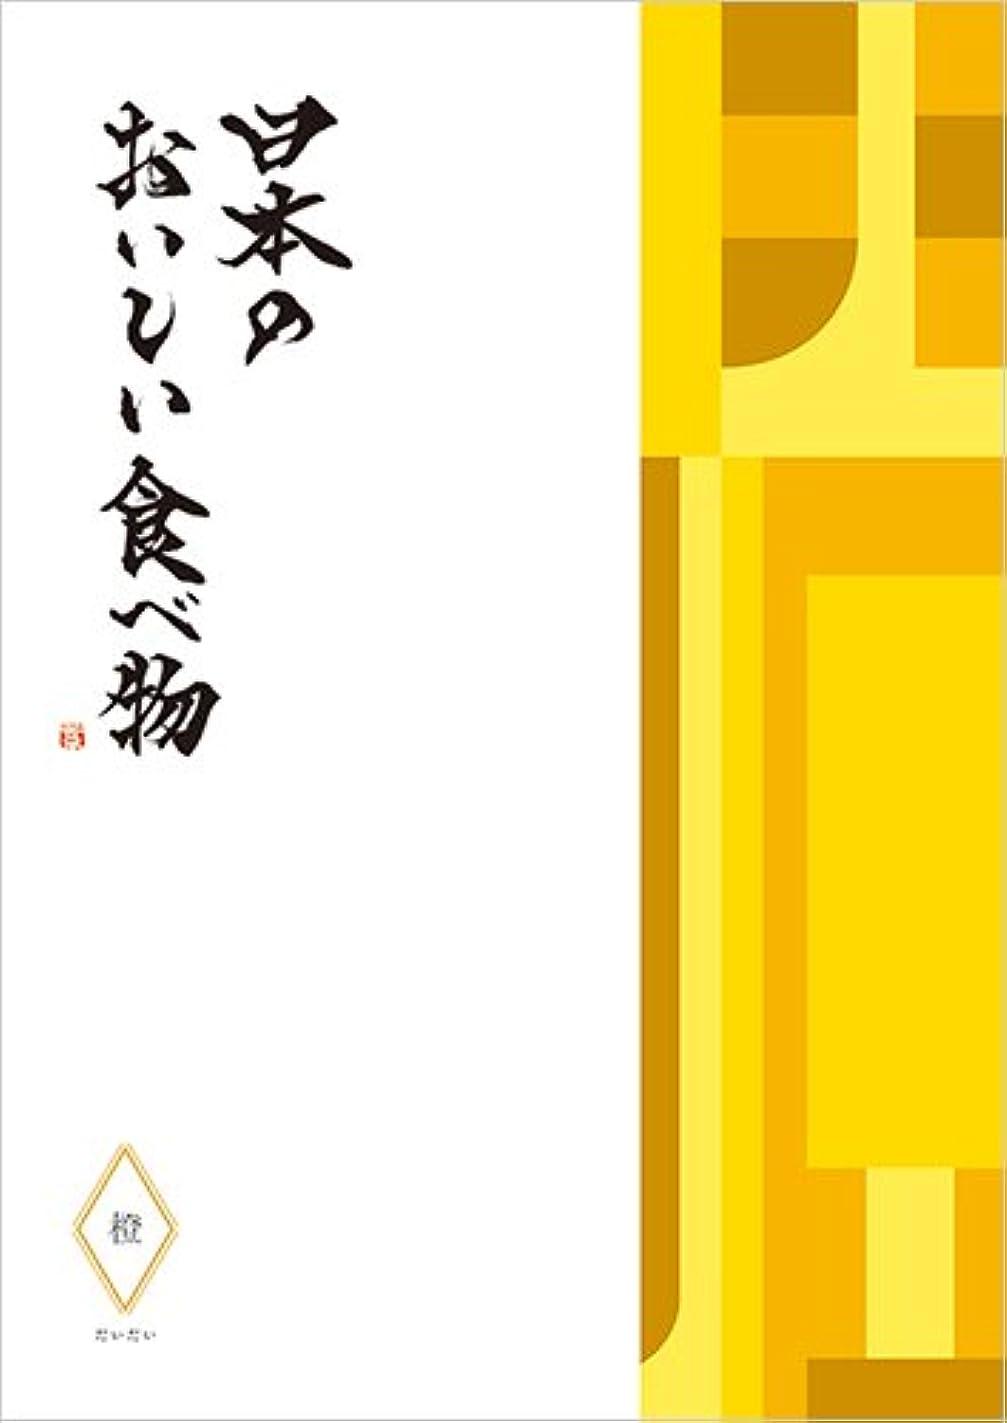 CONCENT 日本のおいしい食べ物 グルメカタログギフト 橙コース